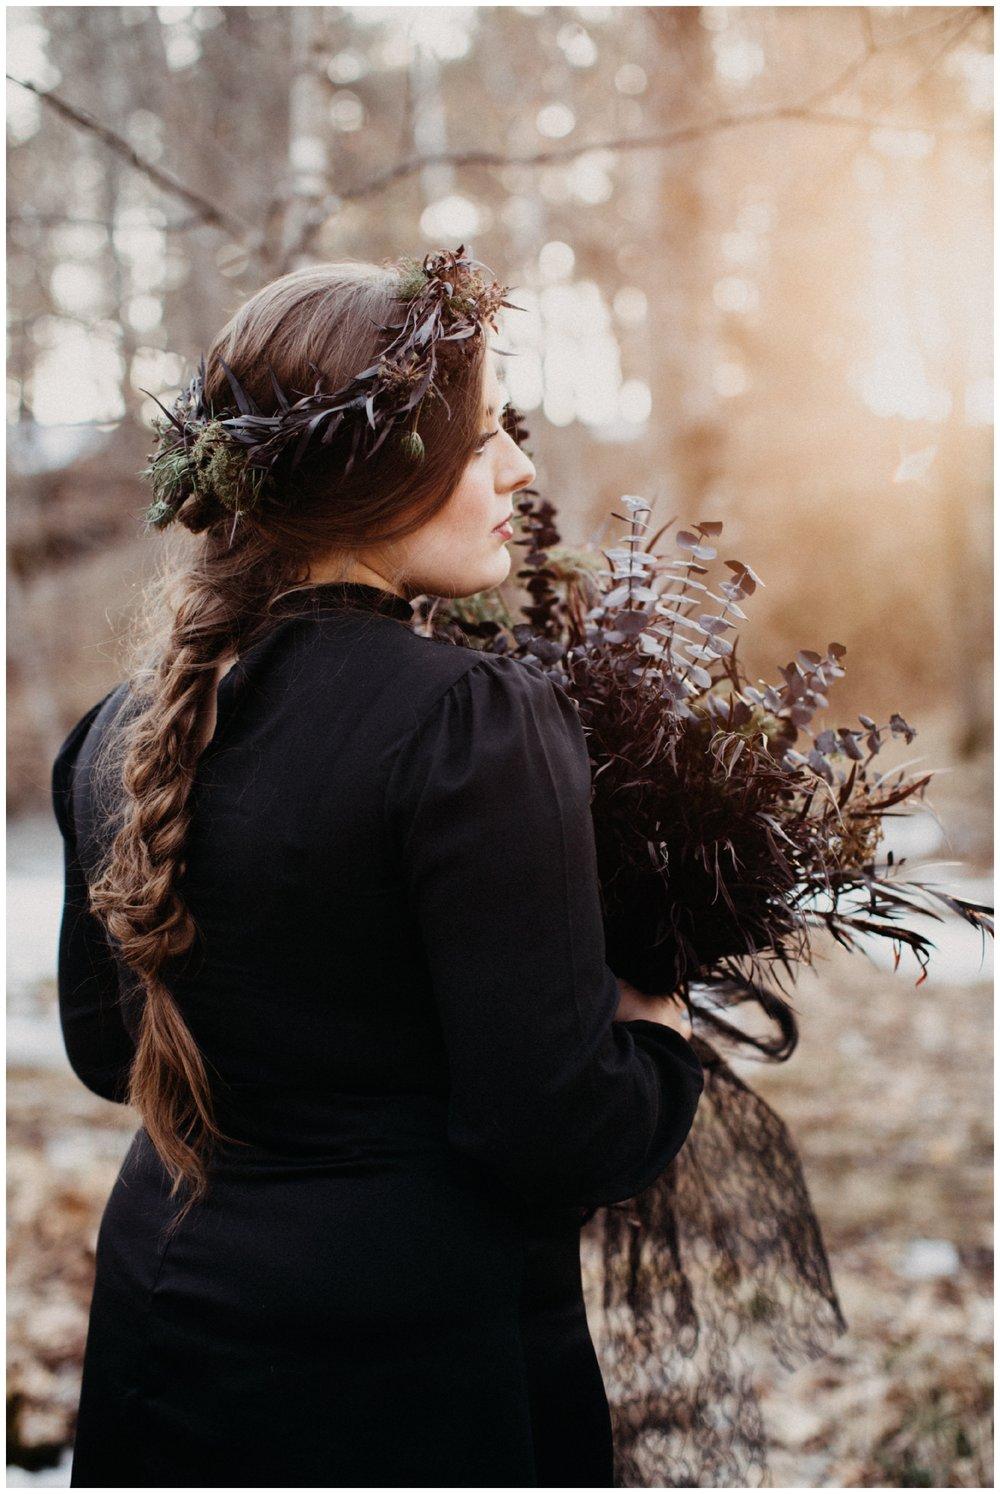 Dark and romantic inspired bridal shoot by Britt DeZeeuw, Brainerd MN wedding photographer